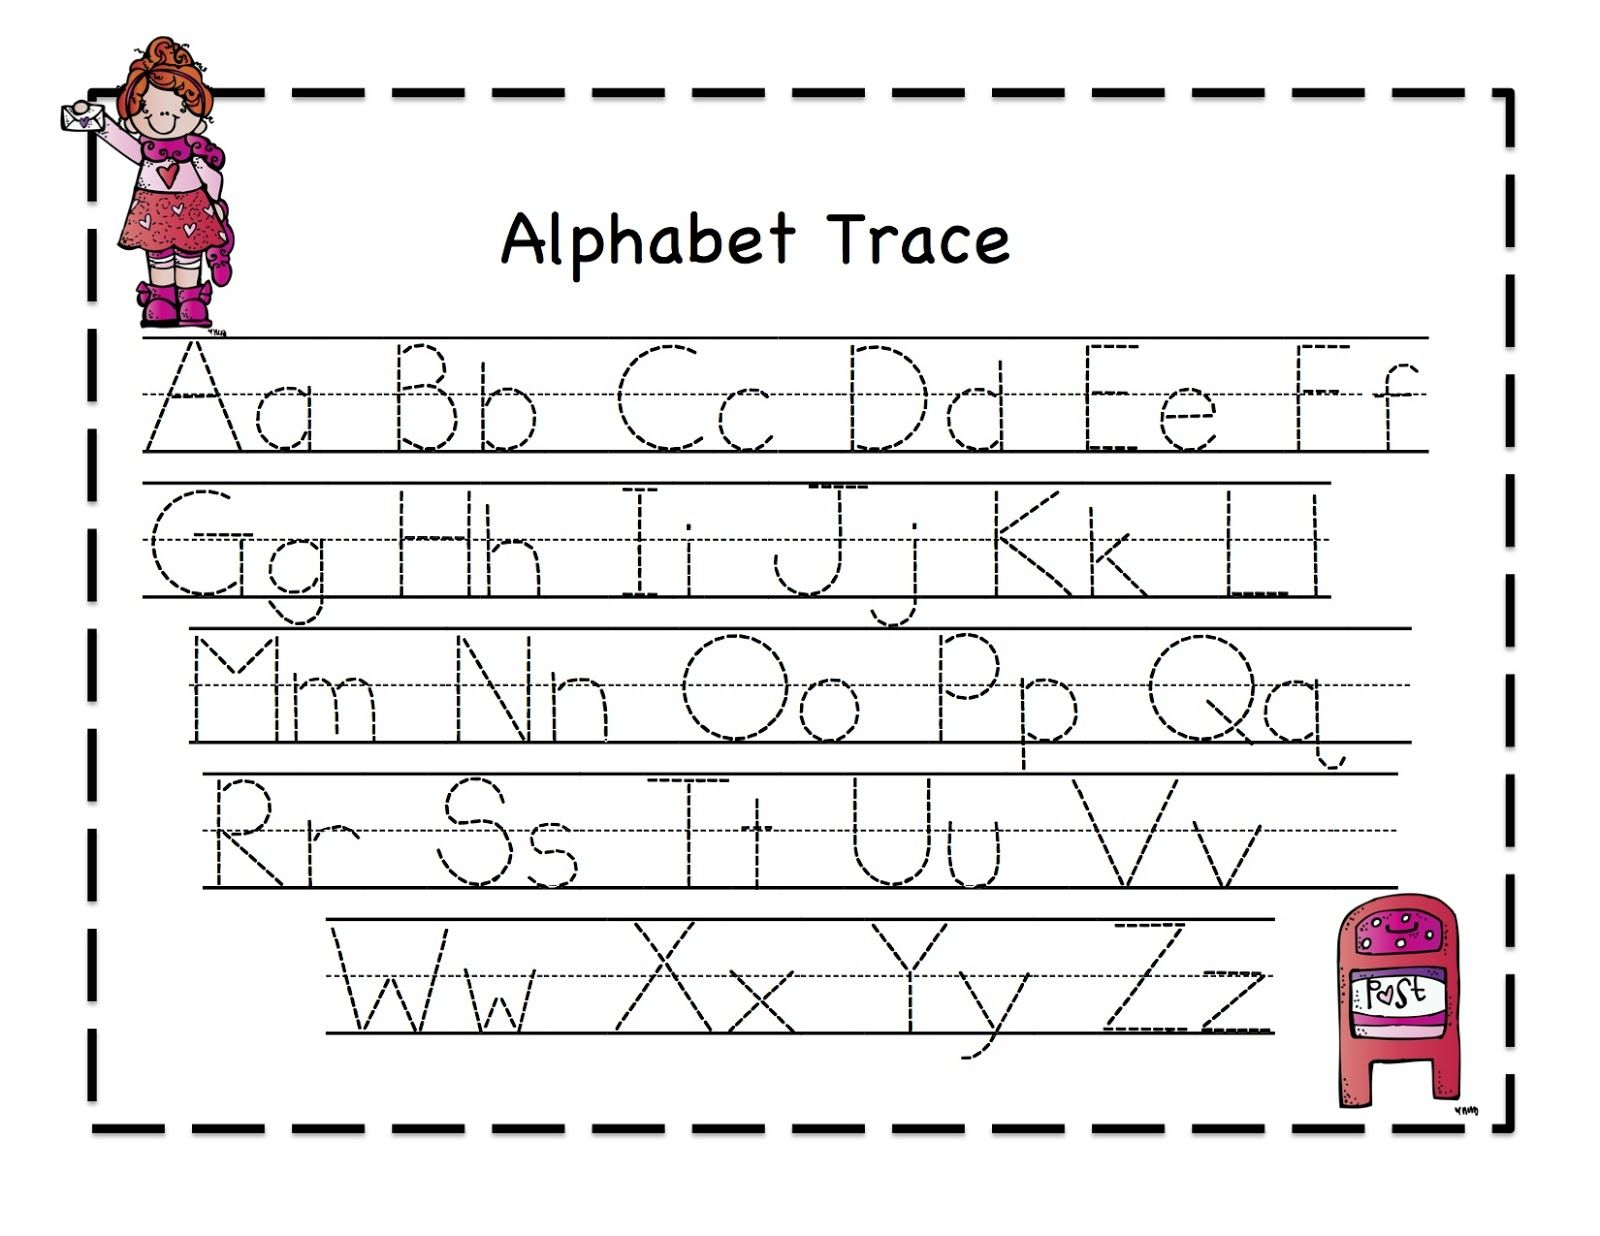 Abc Tracing Sheets For Preschool Kids   Alphabet Tracing inside Abc Tracing Kindergarten